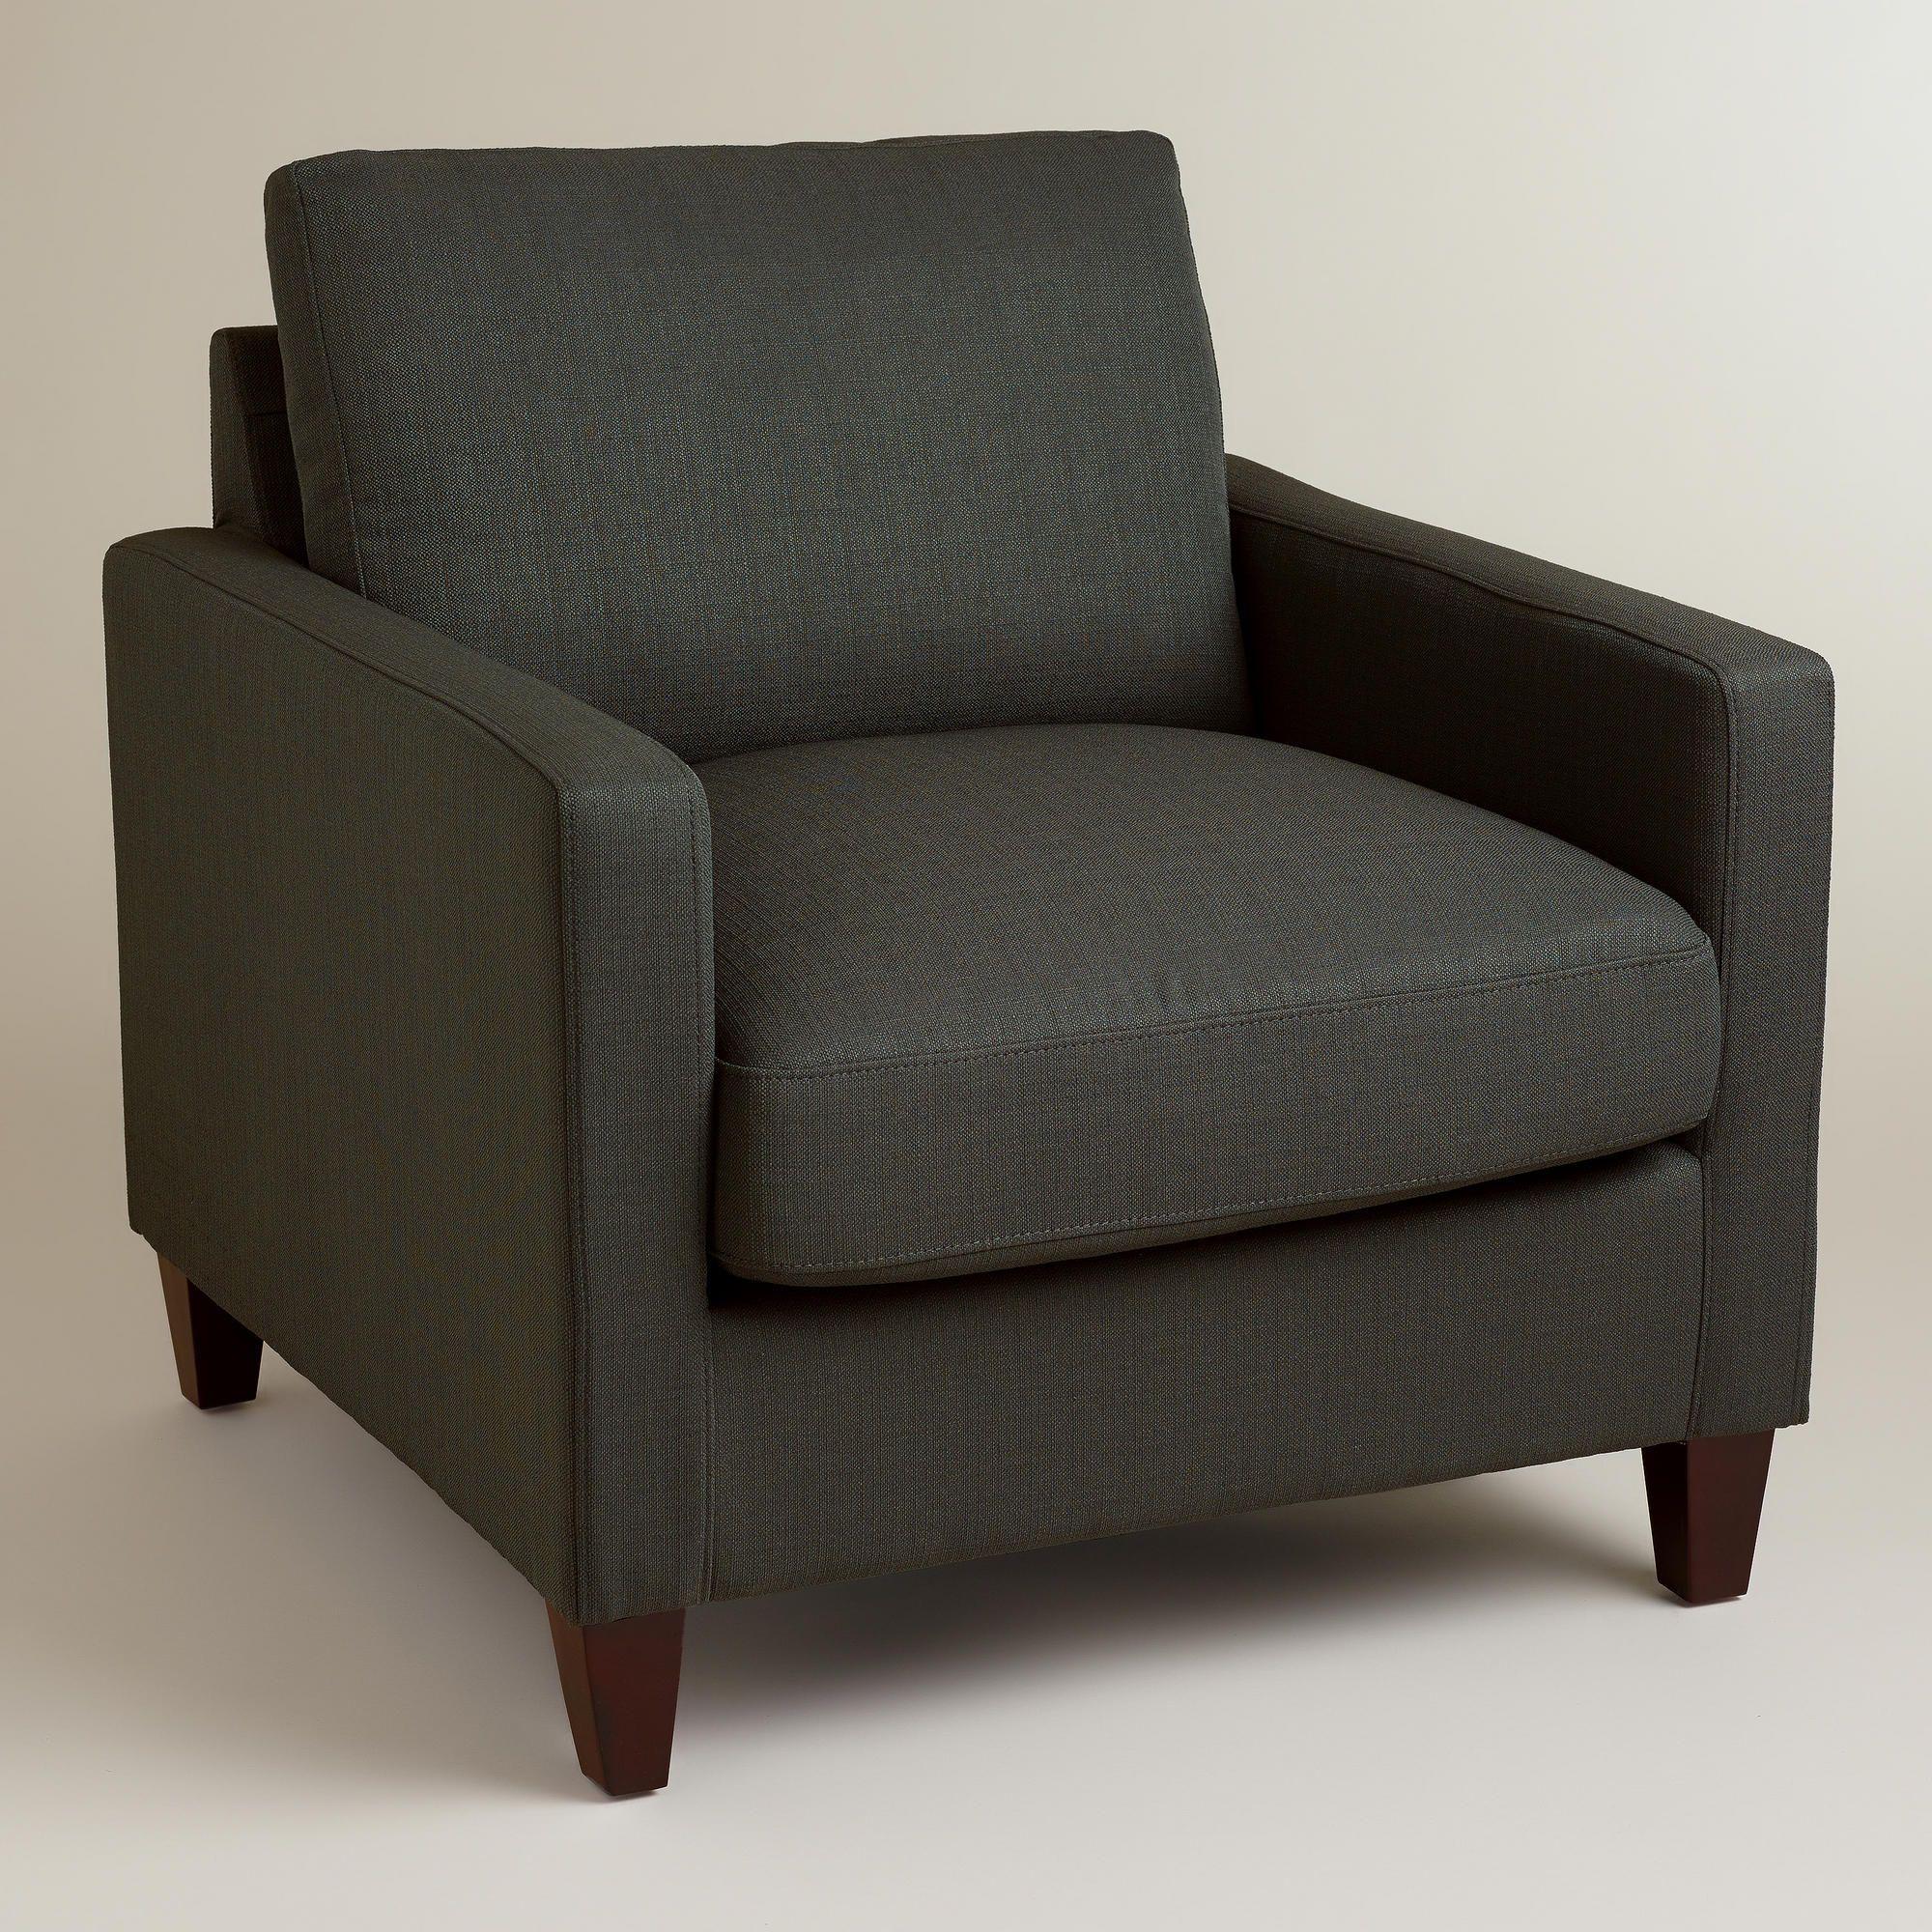 Charcoal Abbott Chair   World Market   Living Room ...